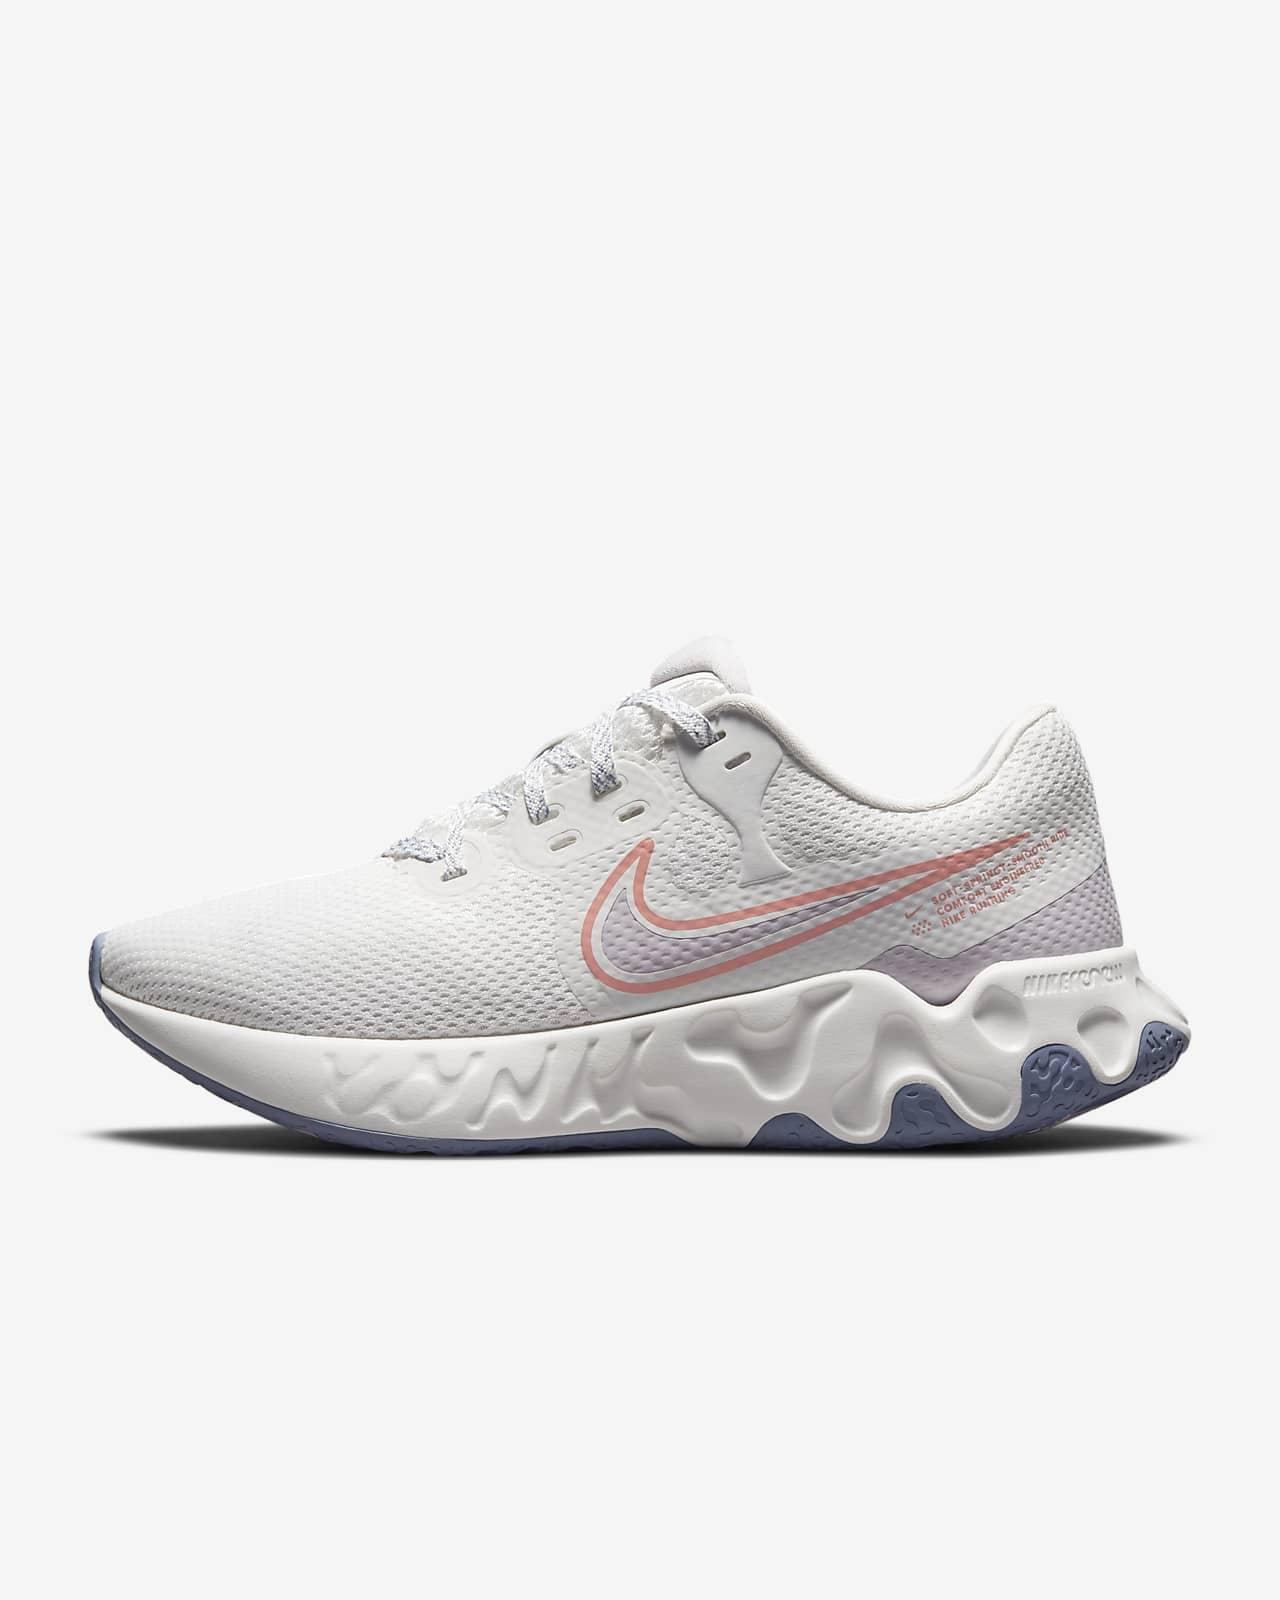 Calzado de running para carretera para mujer Nike Renew Ride 2